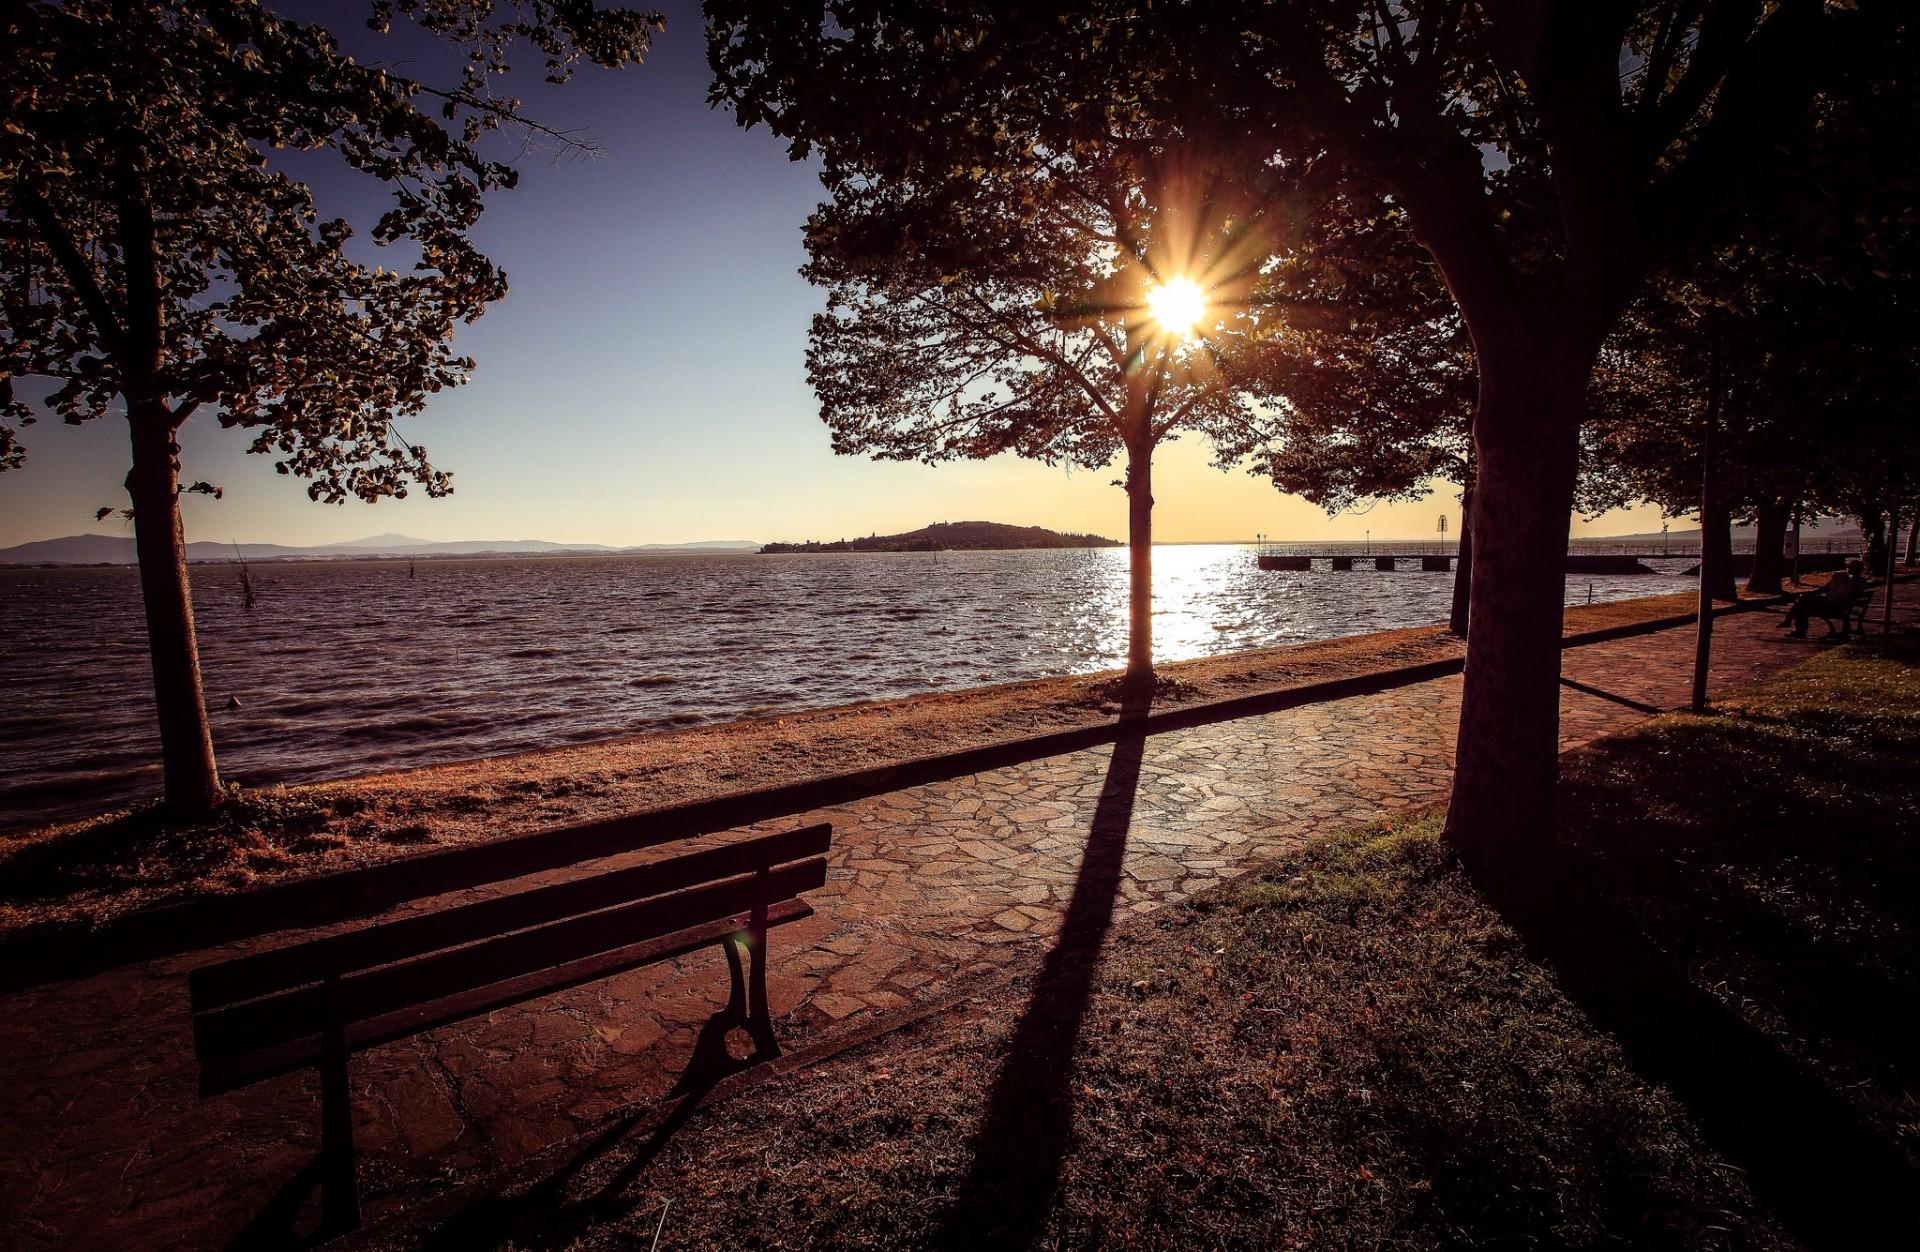 Lago Trasimeno: itinerario selvaggio, itinerario panoramico, itinerario storico